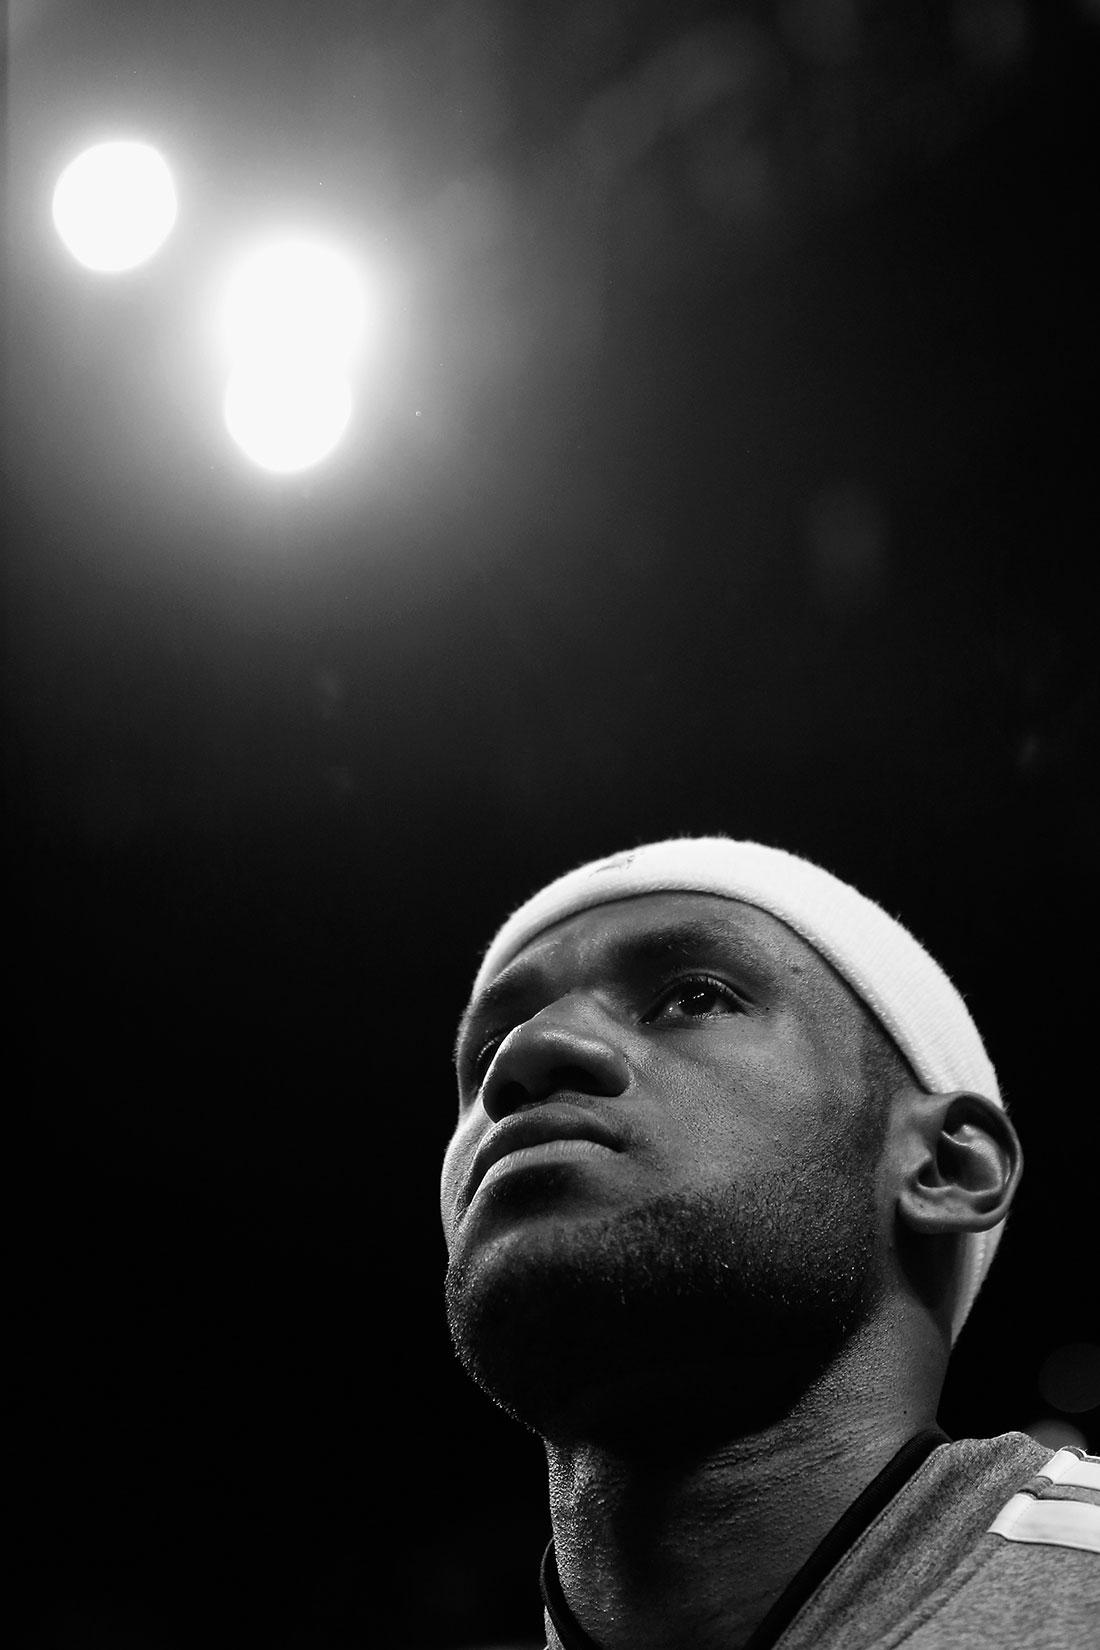 LeBron James por Viva Basquet Photo by Christopher Trotman/Getty Images